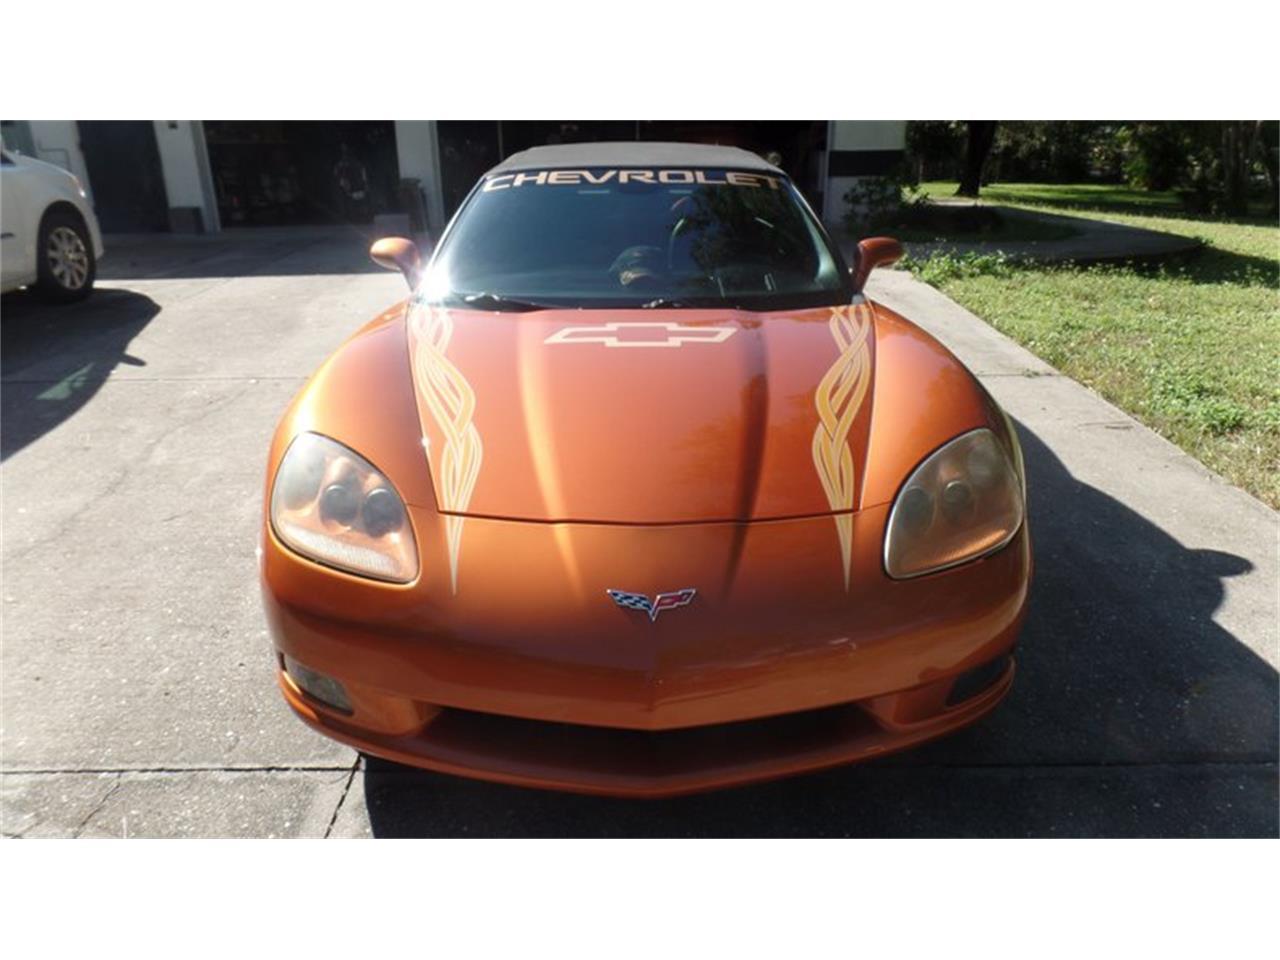 2007 Chevrolet Corvette (CC-1421585) for sale in Punta Gorda, Florida